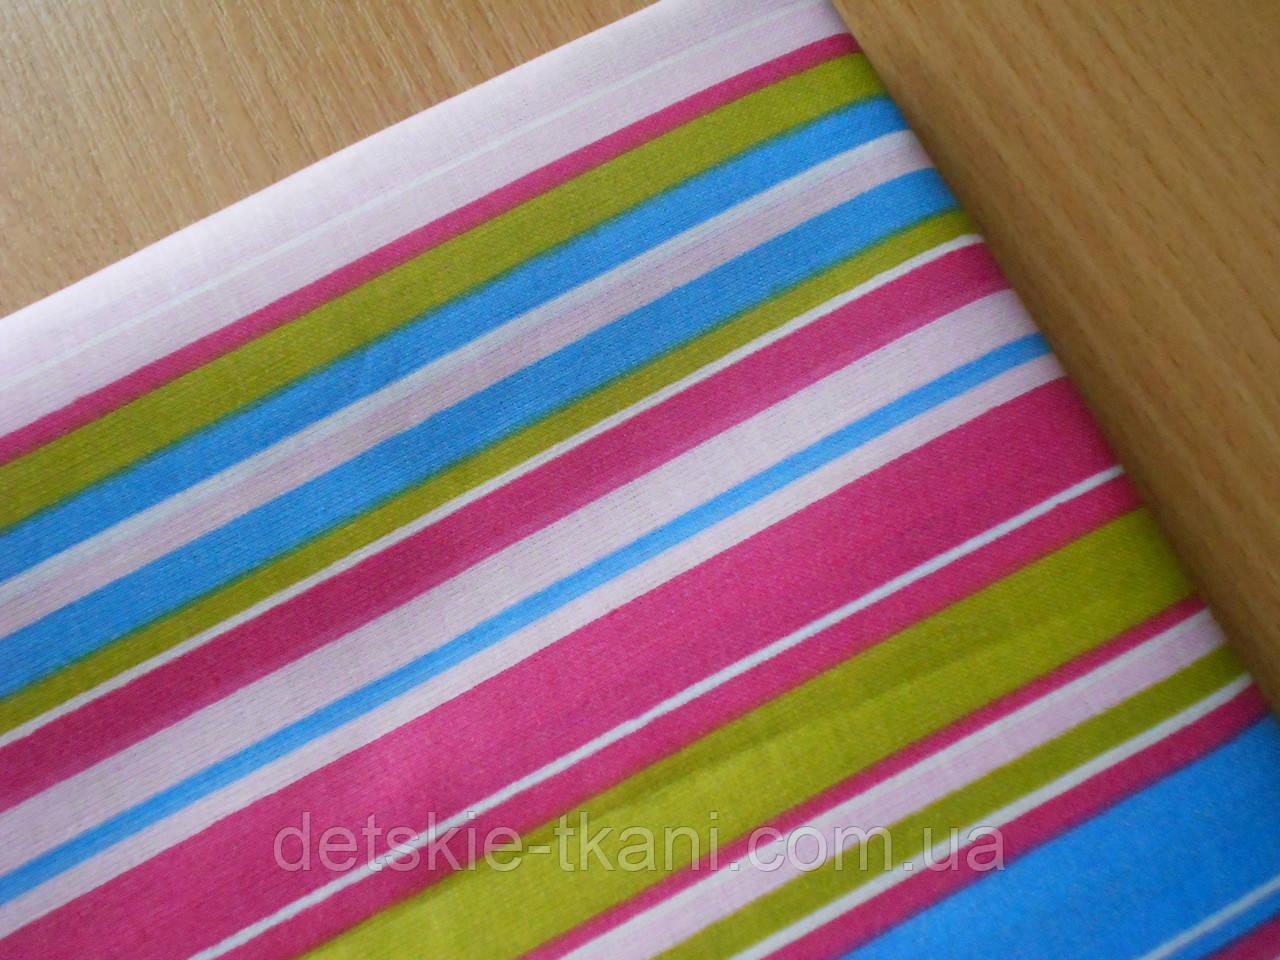 Лоскут ткани №193 размером 25*80 см